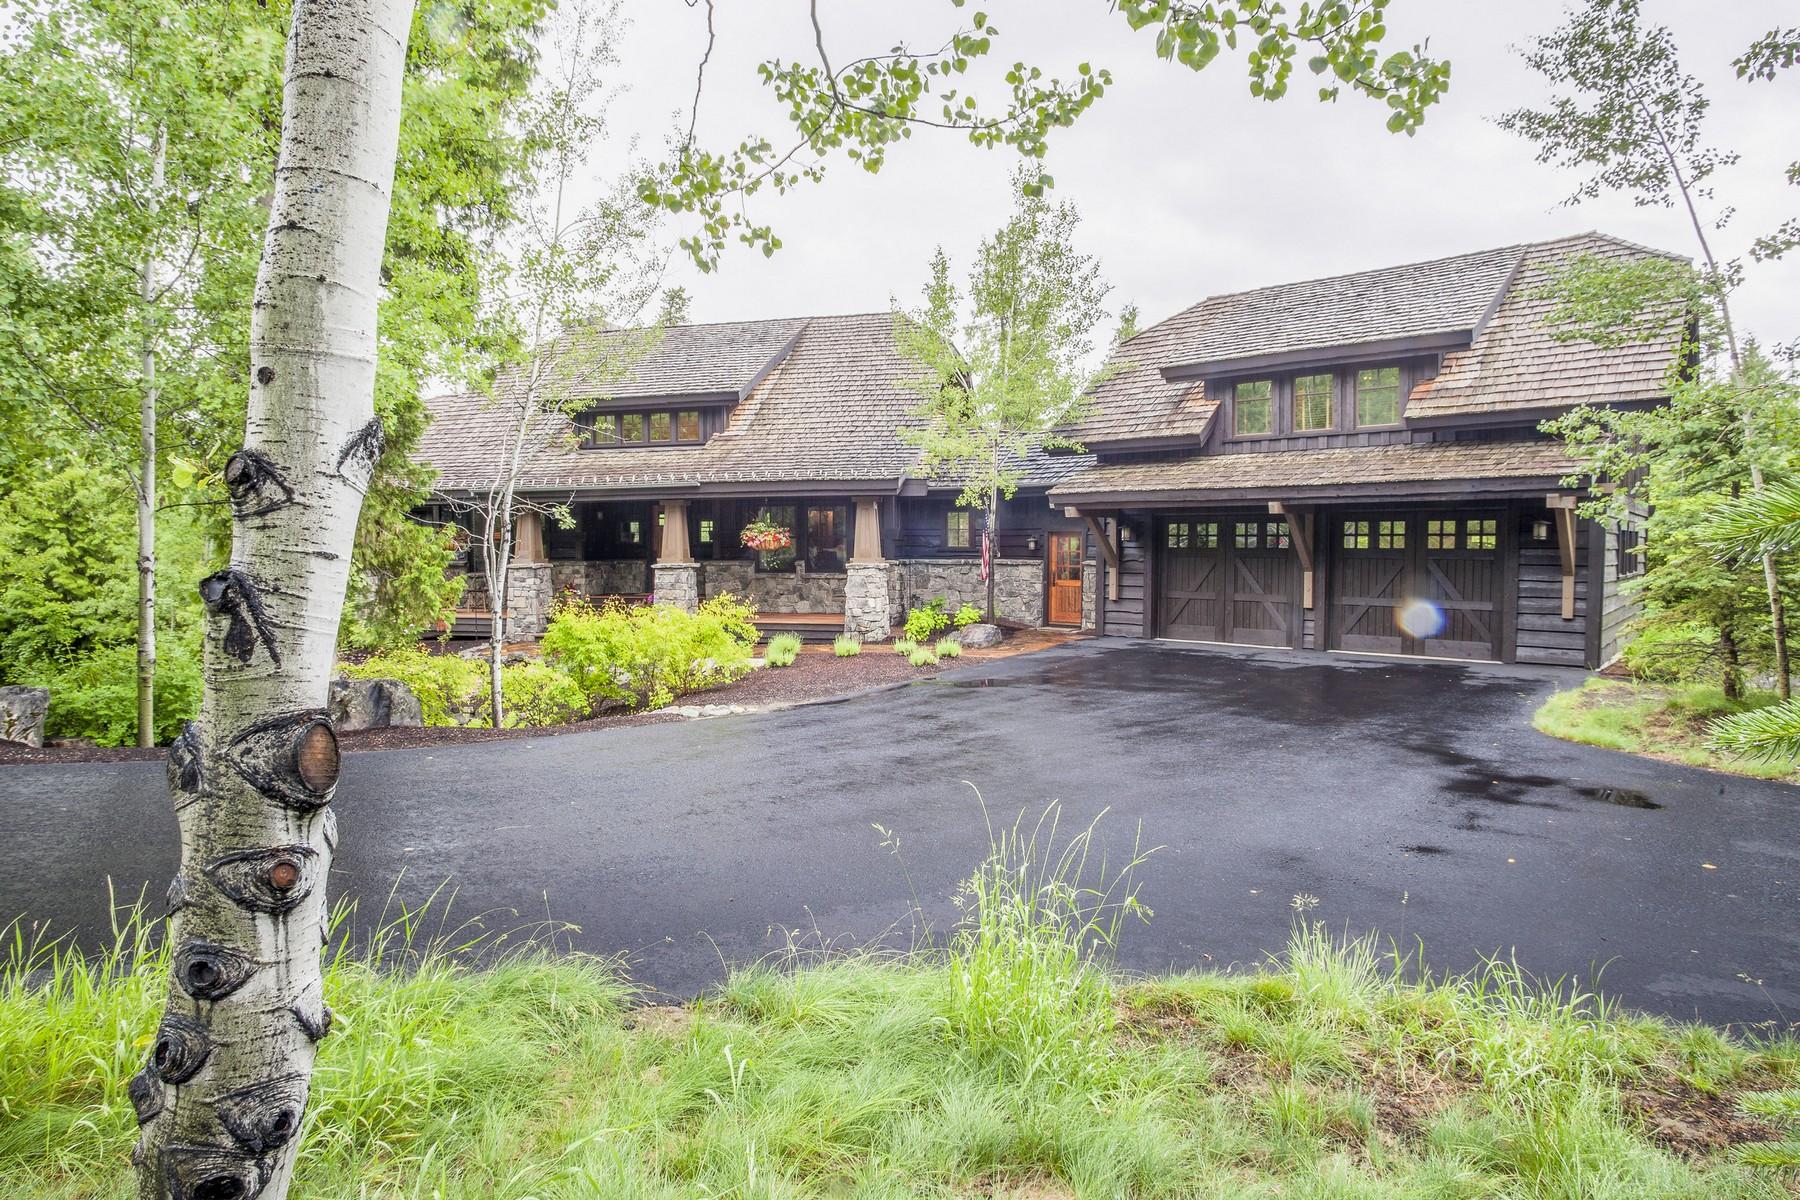 独户住宅 为 销售 在 Beautiful Home with Lush Grounds 177 S Shooting Star Iron Horse Golf Community, 怀特菲什, 蒙大拿州, 59937 美国